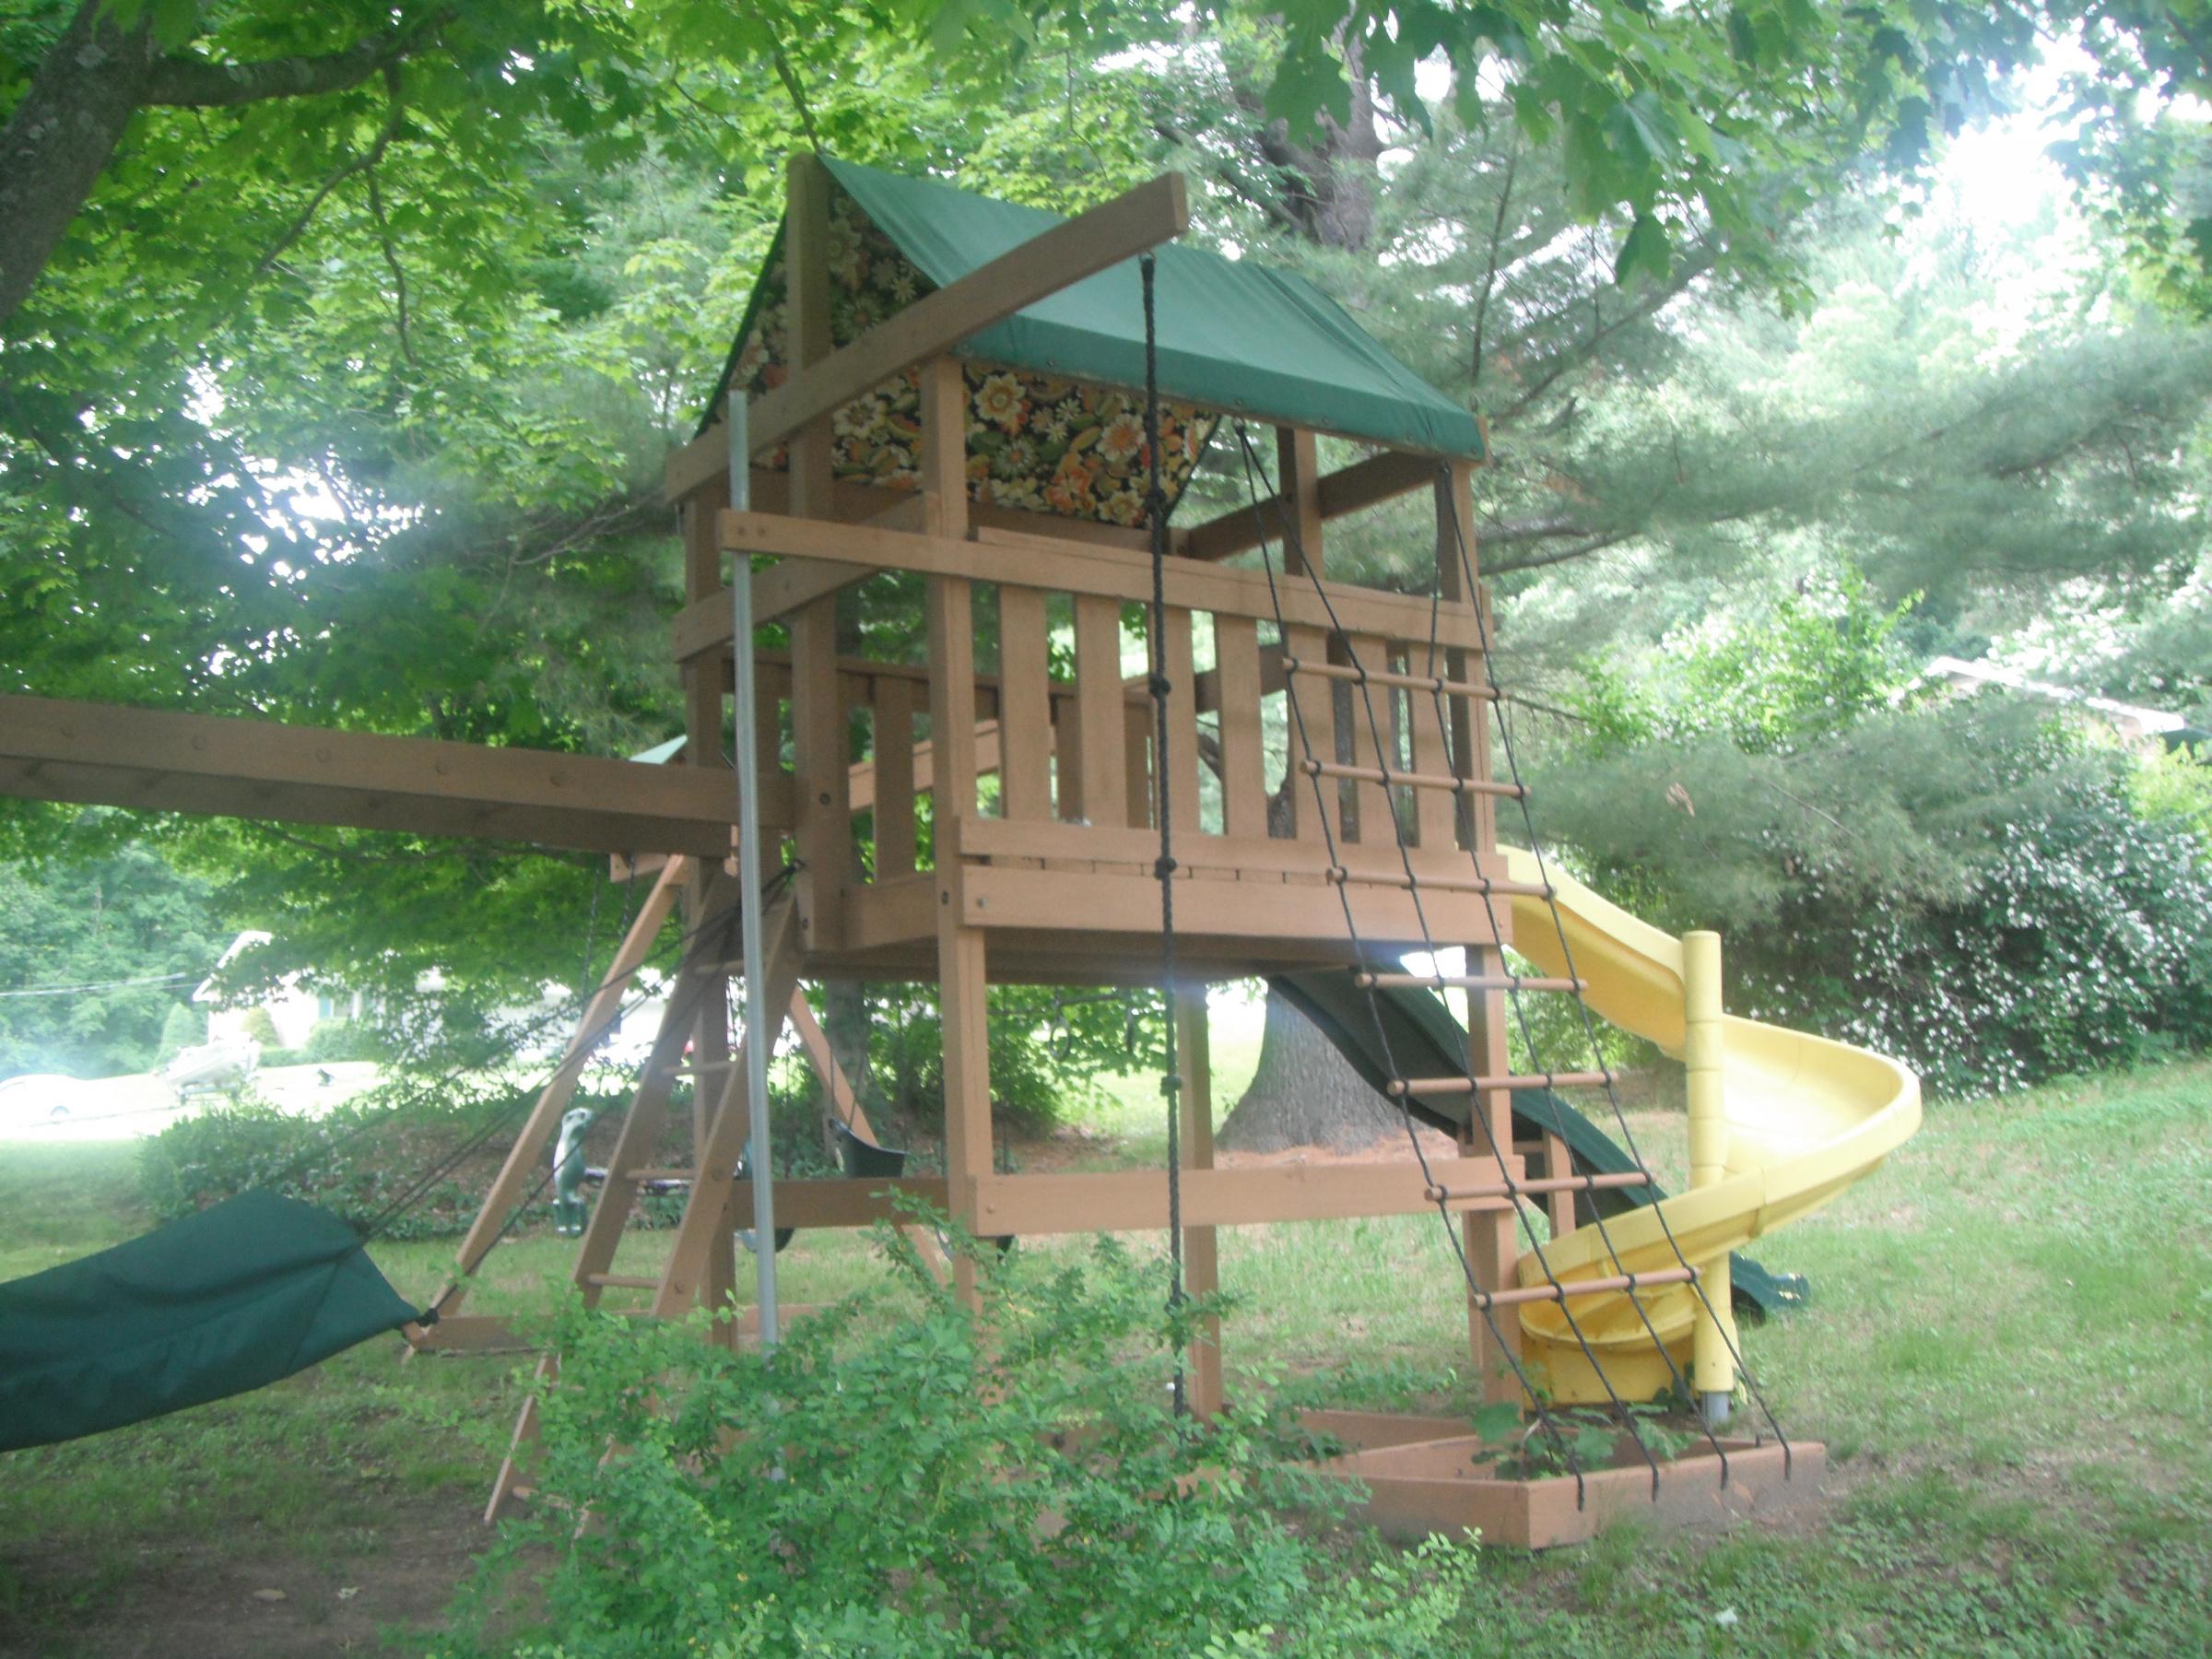 Project Playground-dscf0139.jpg